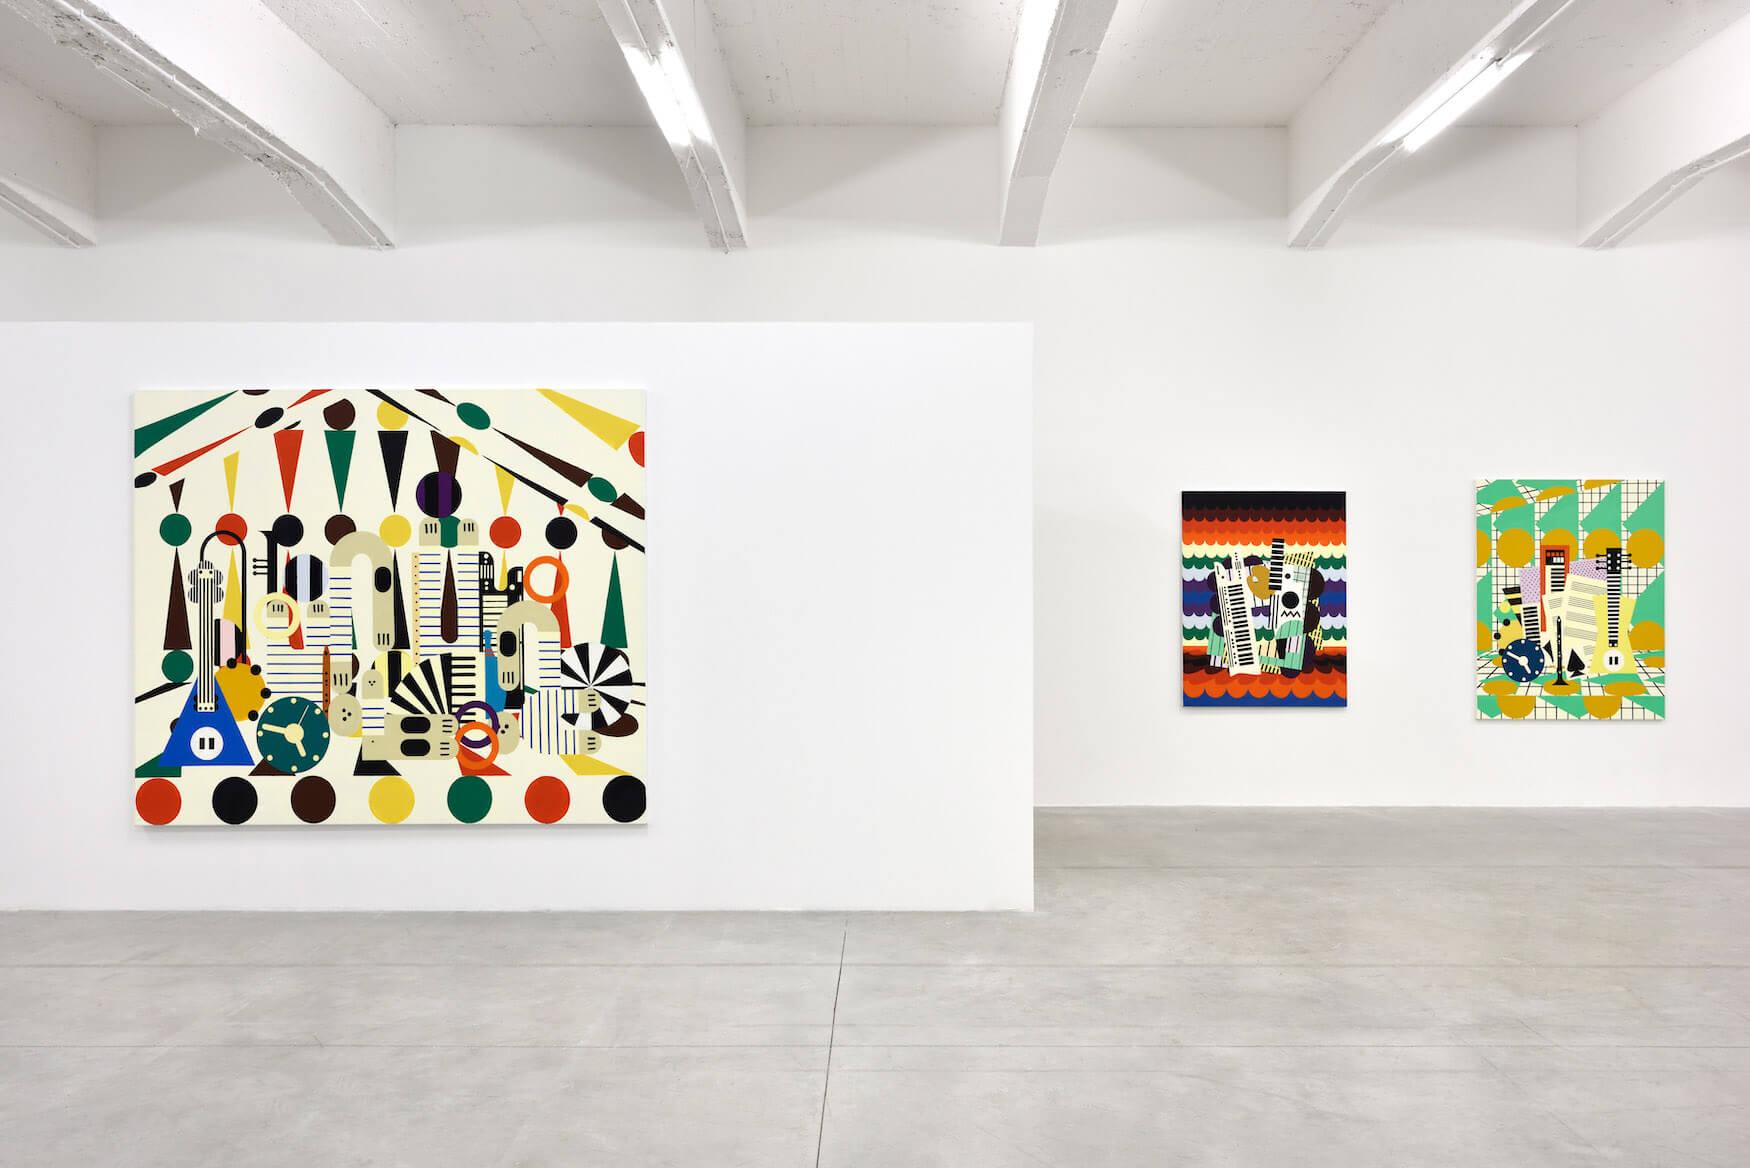 Farah_Atassi_circus 2_still_life_keyboard_jazz_set_Consortium_Museum.jpg